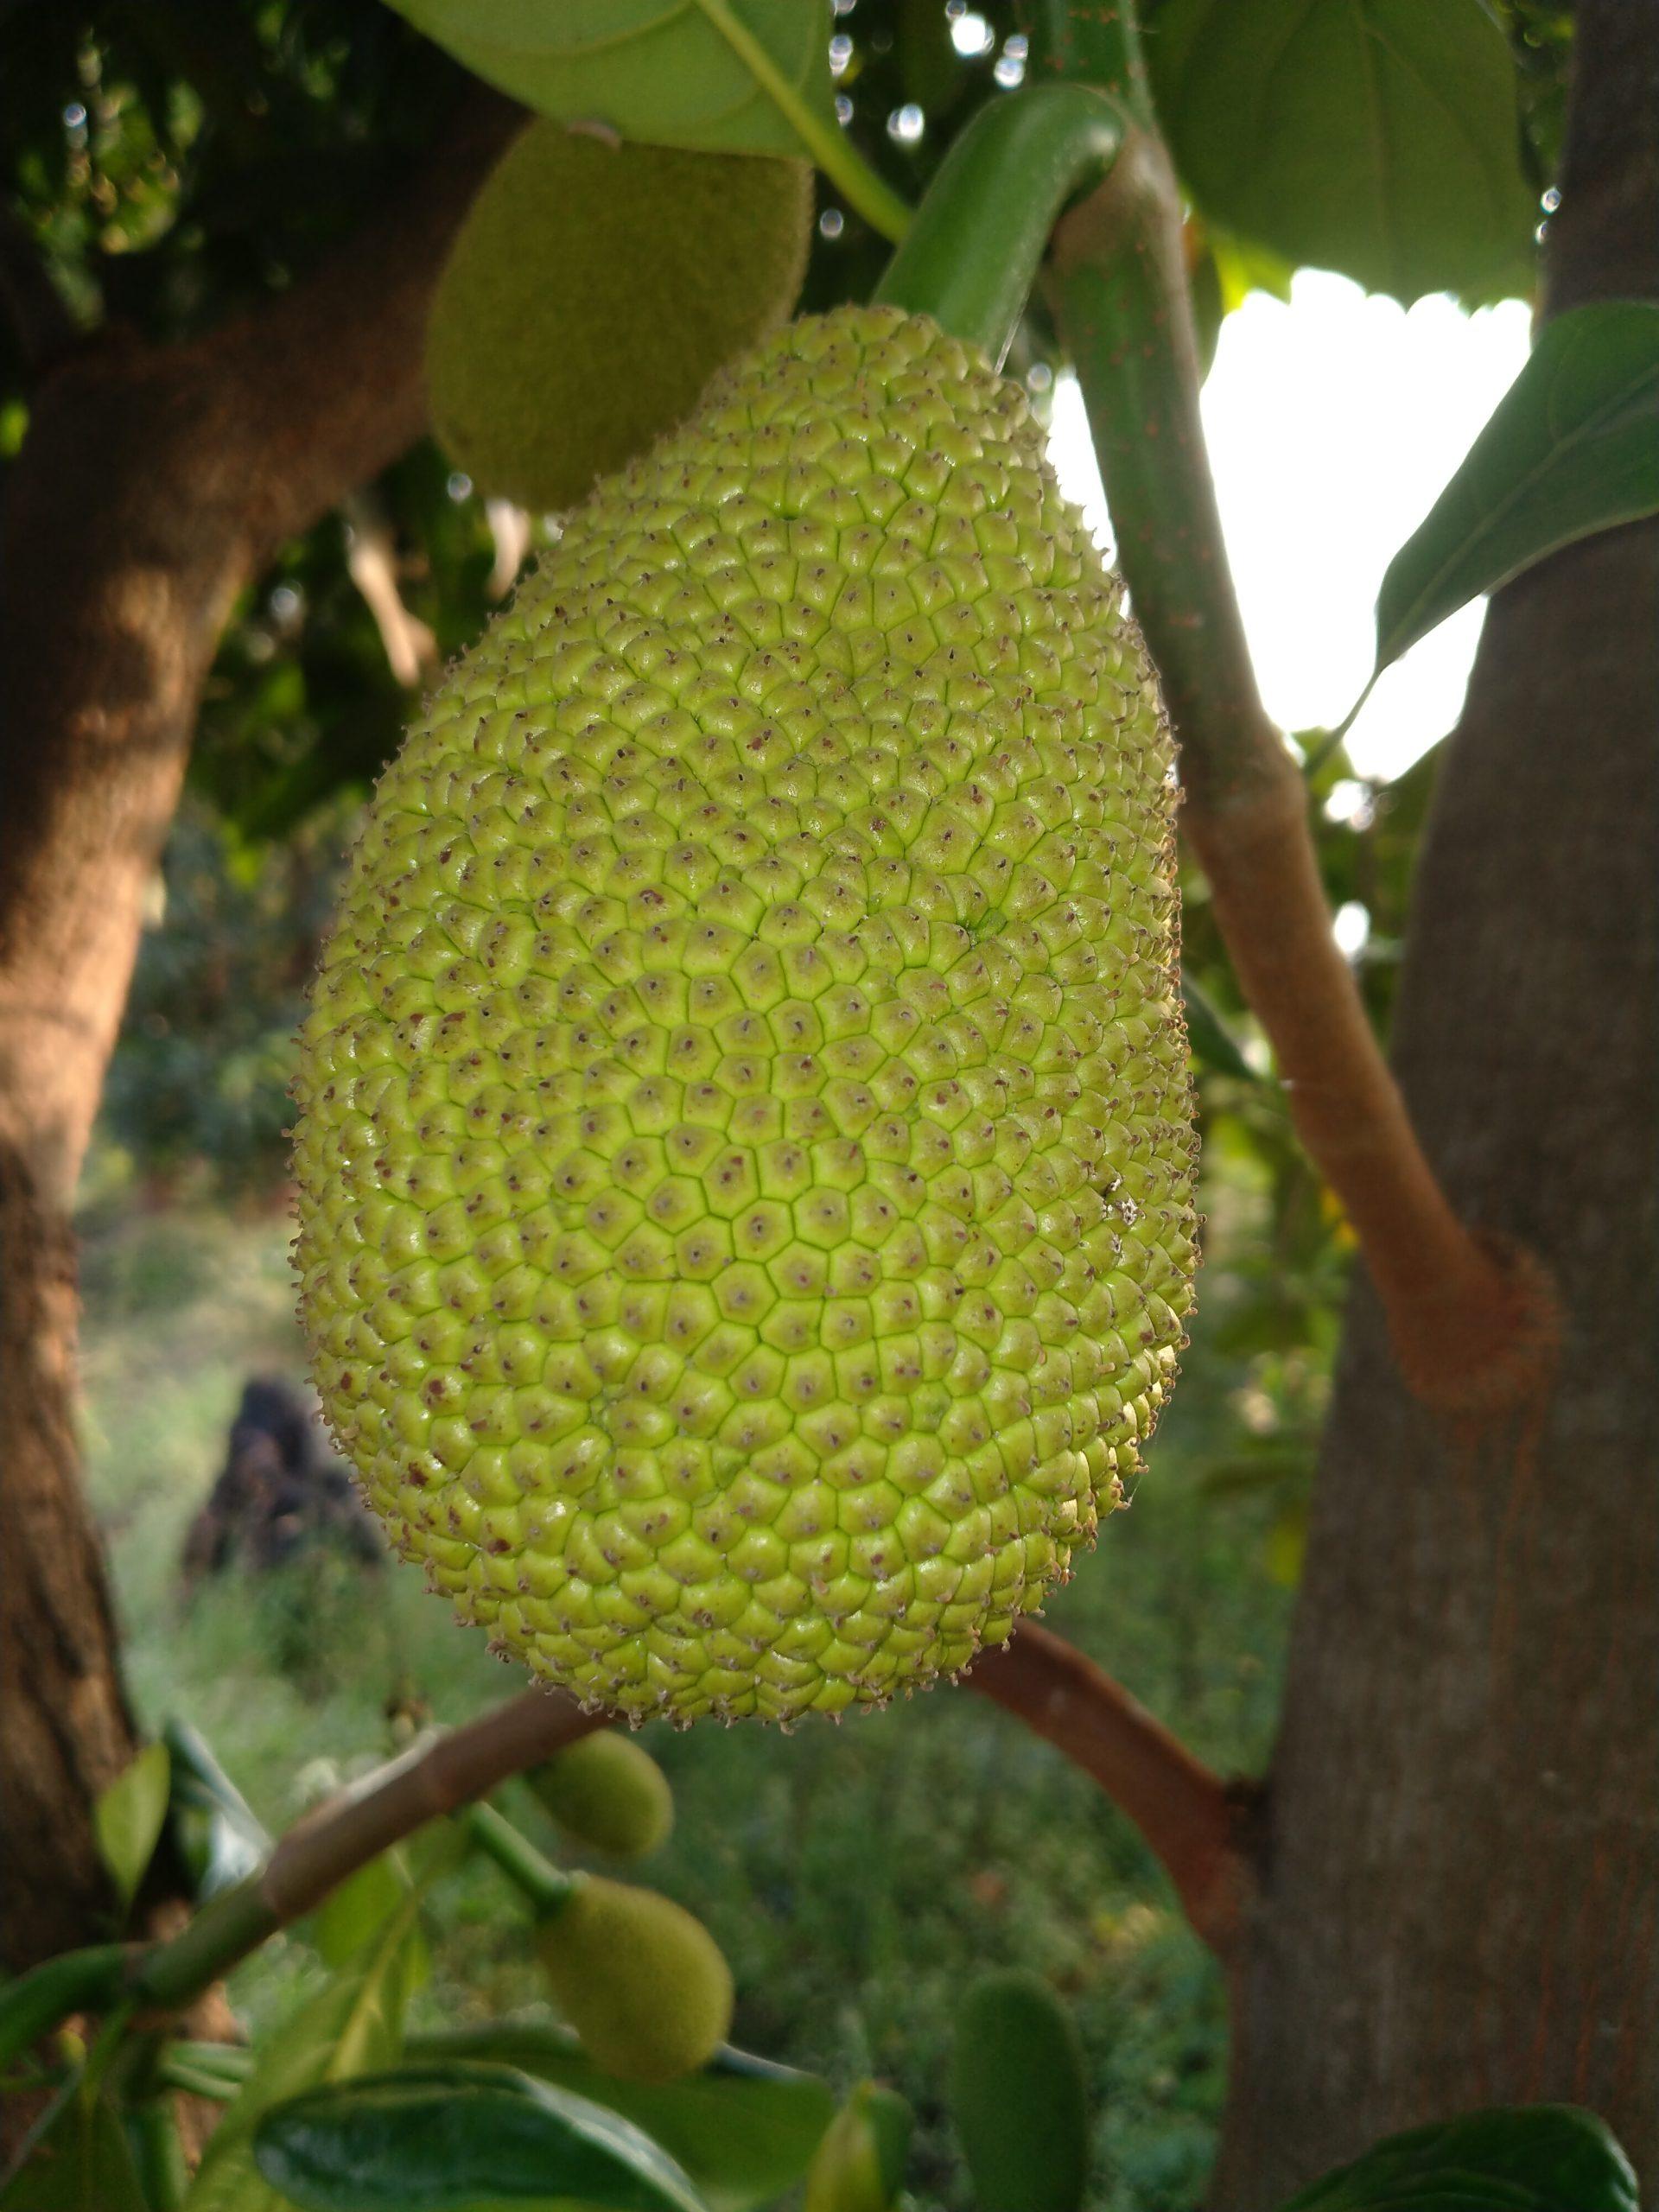 Jackfruit hanging on tree